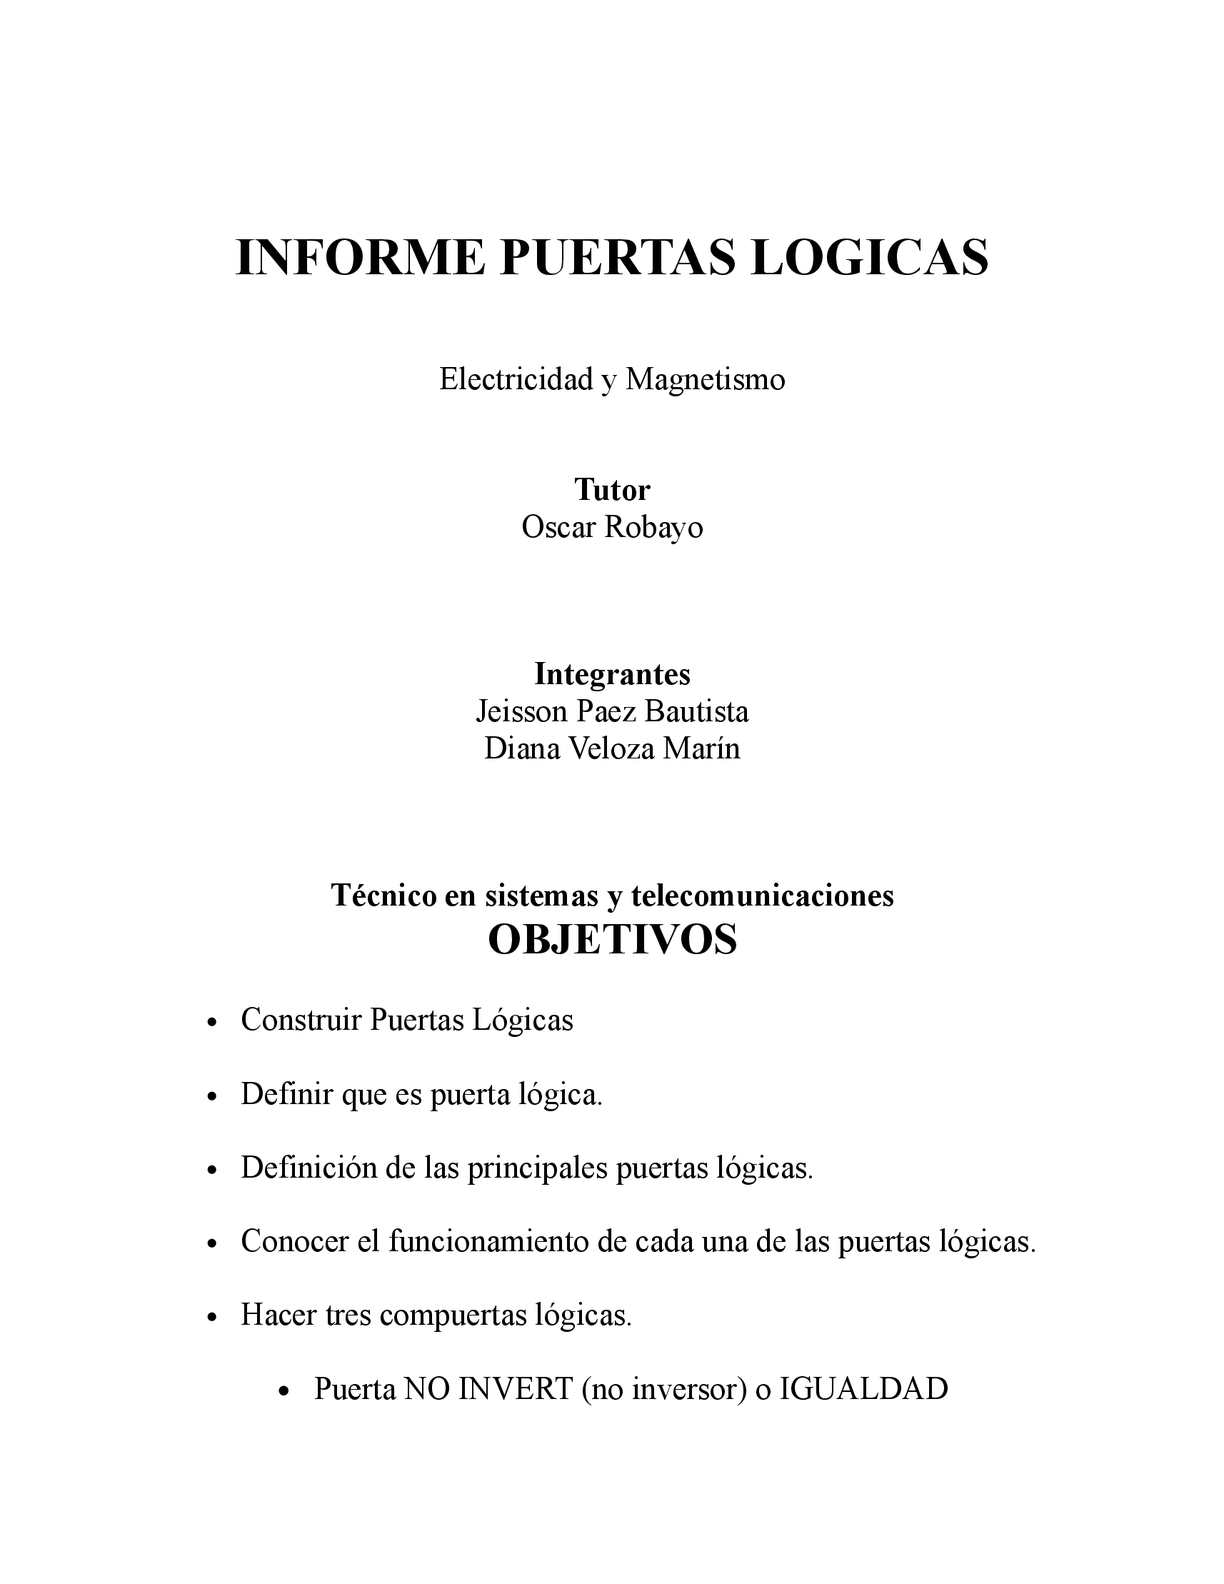 Circuito Xnor : Calaméo informe puerta logica